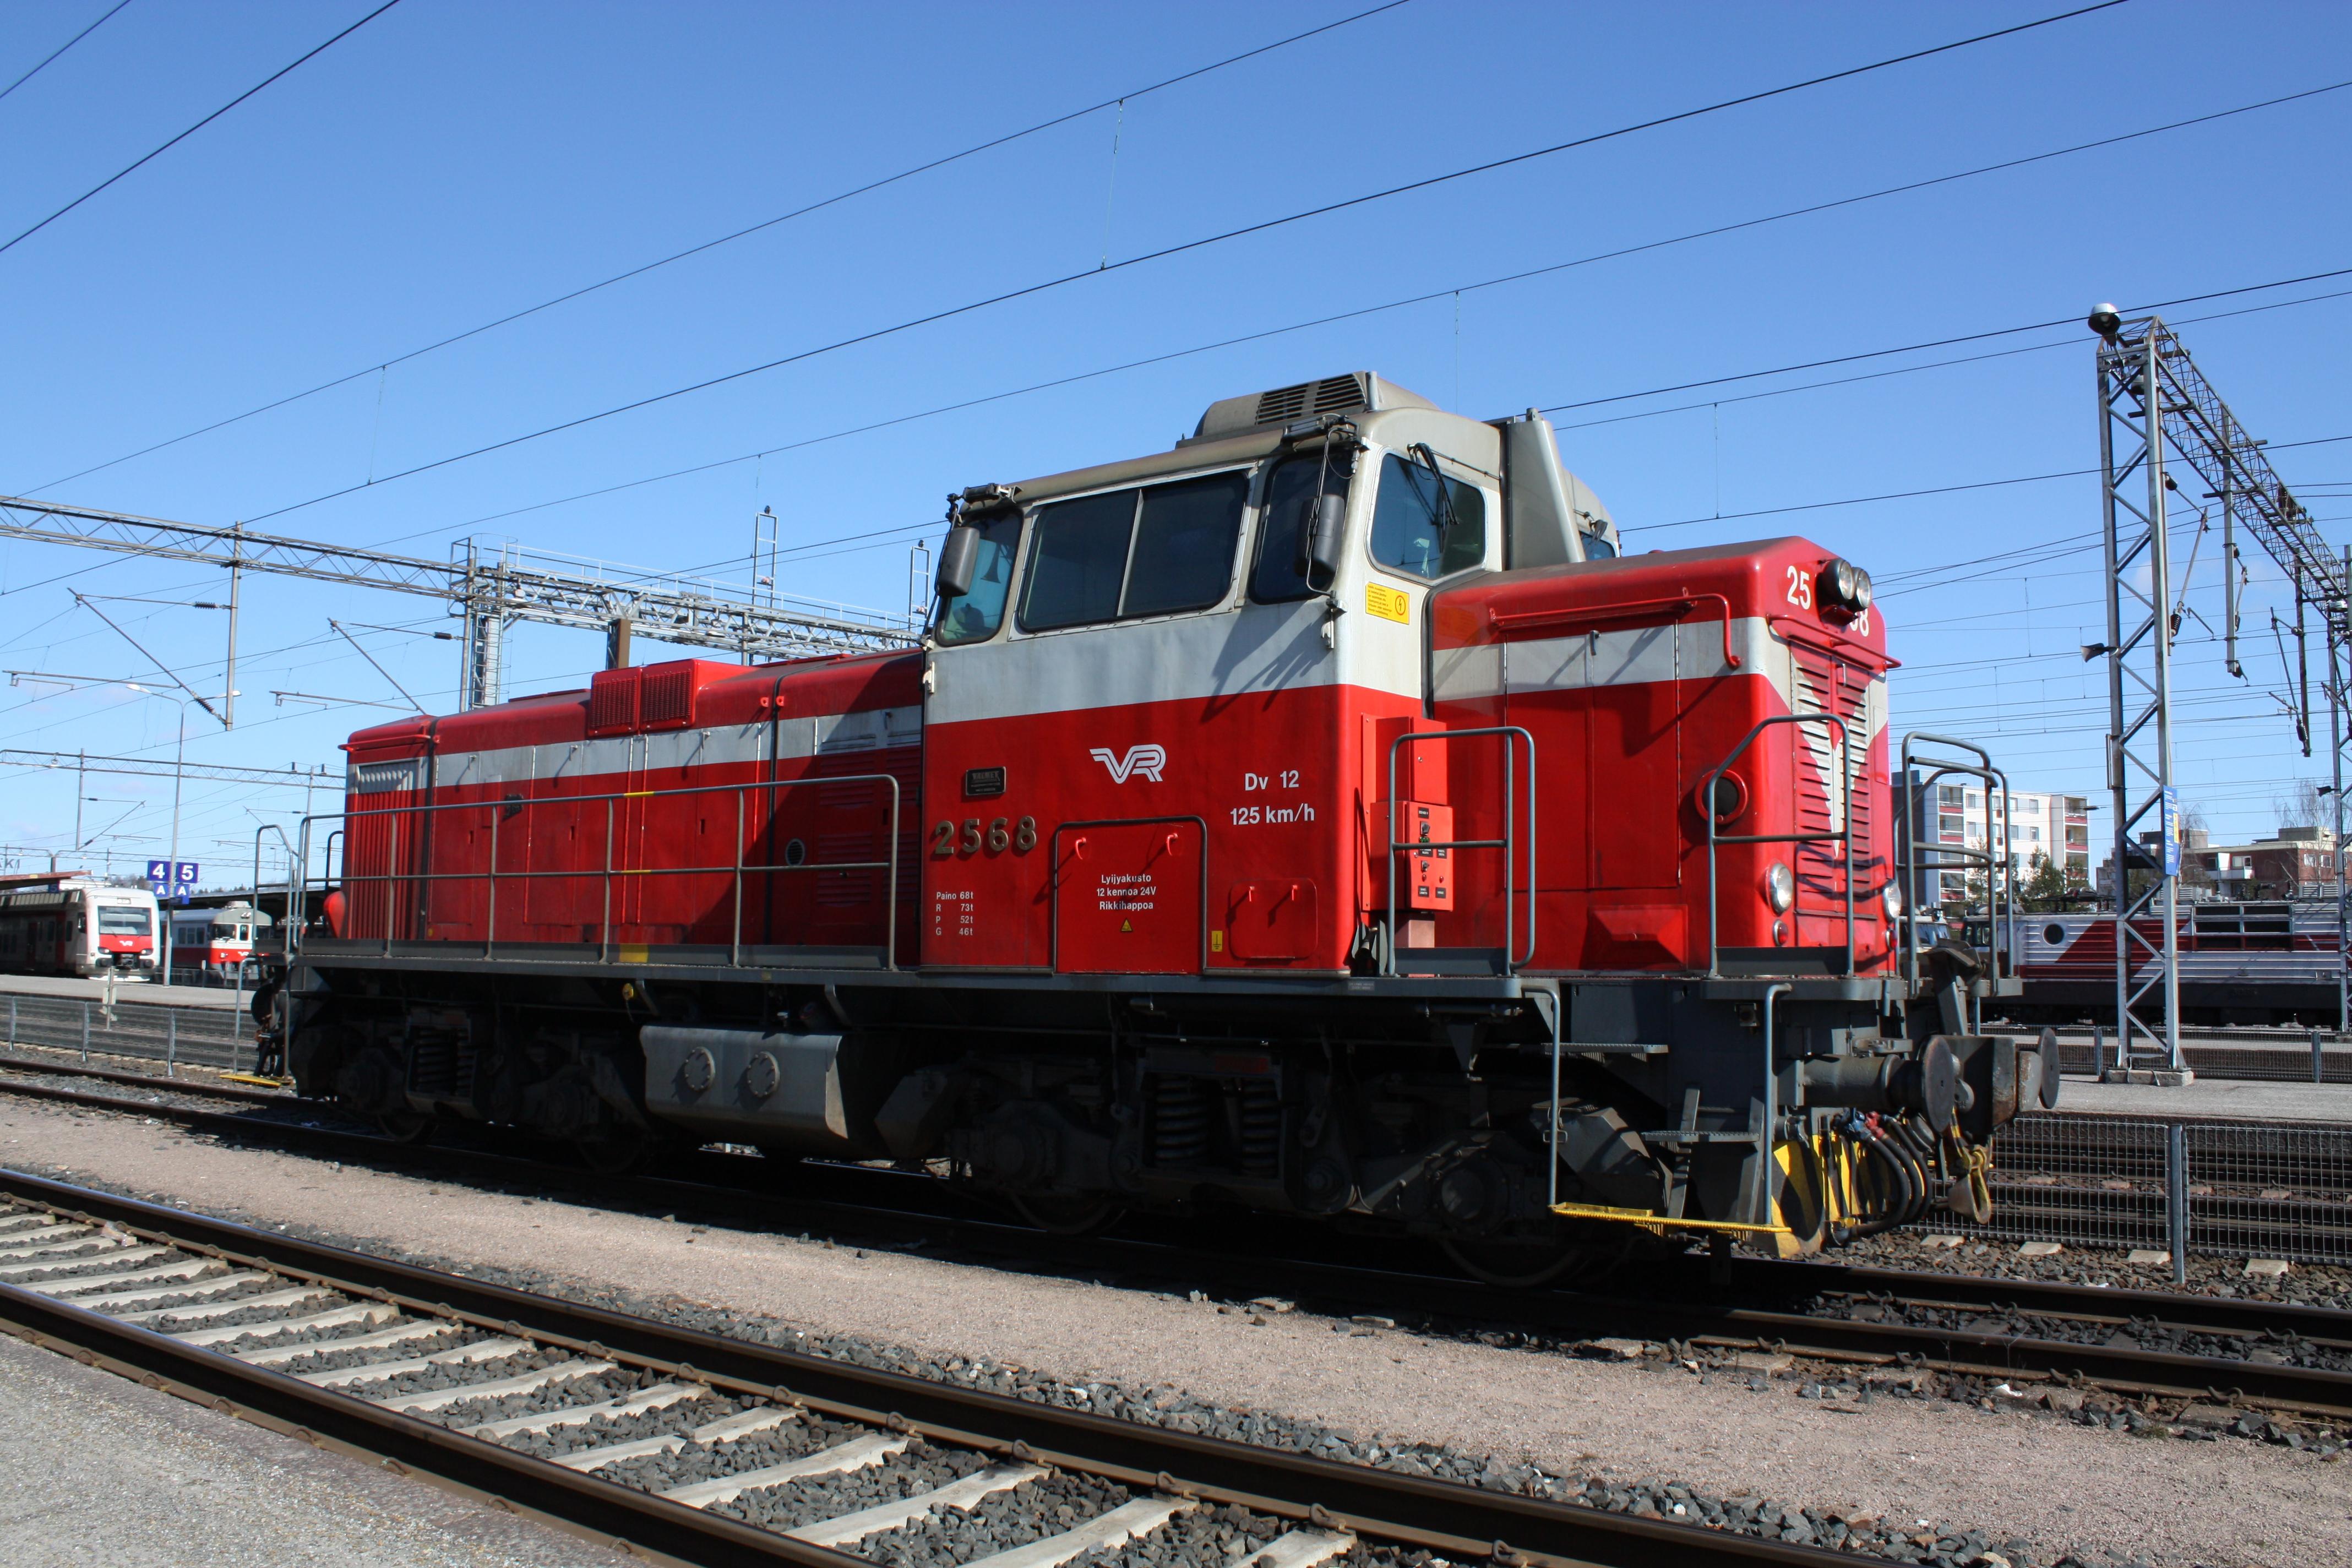 File:Dieselveturi Dv 12 2568 IM6218 C.JPG